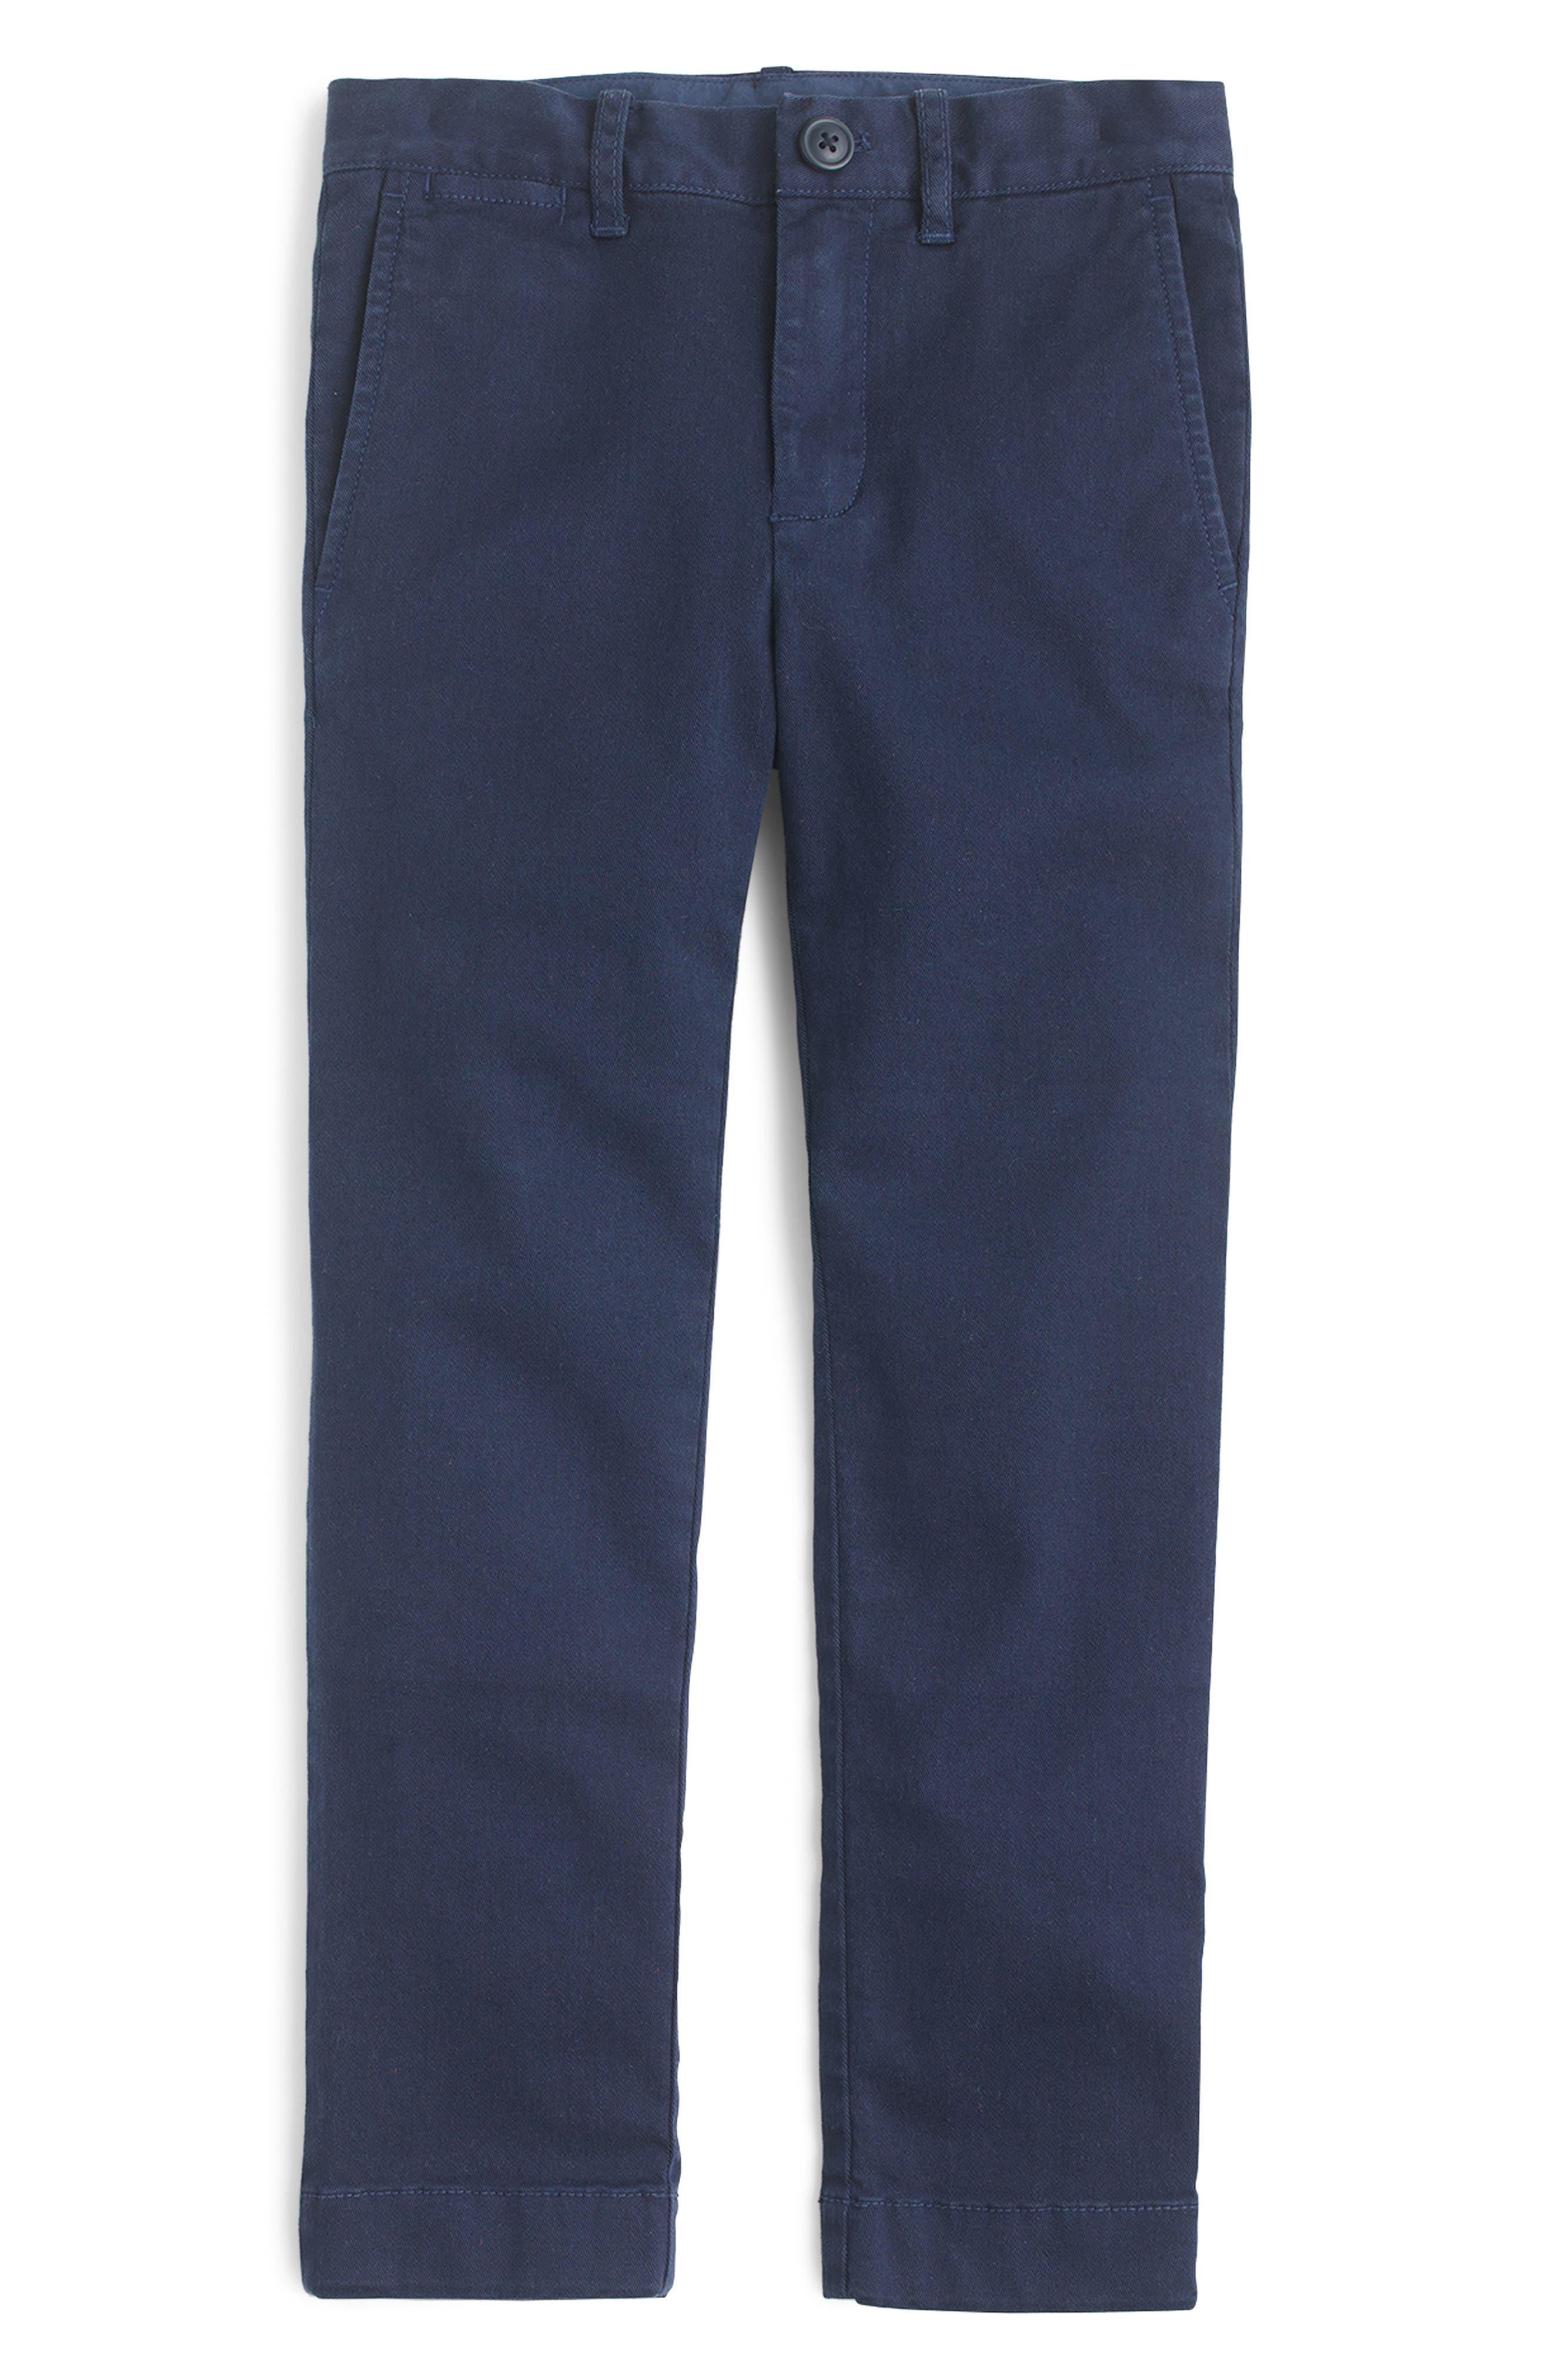 Boys Crewcuts By Jcrew Chino Pants Size 16  Blue